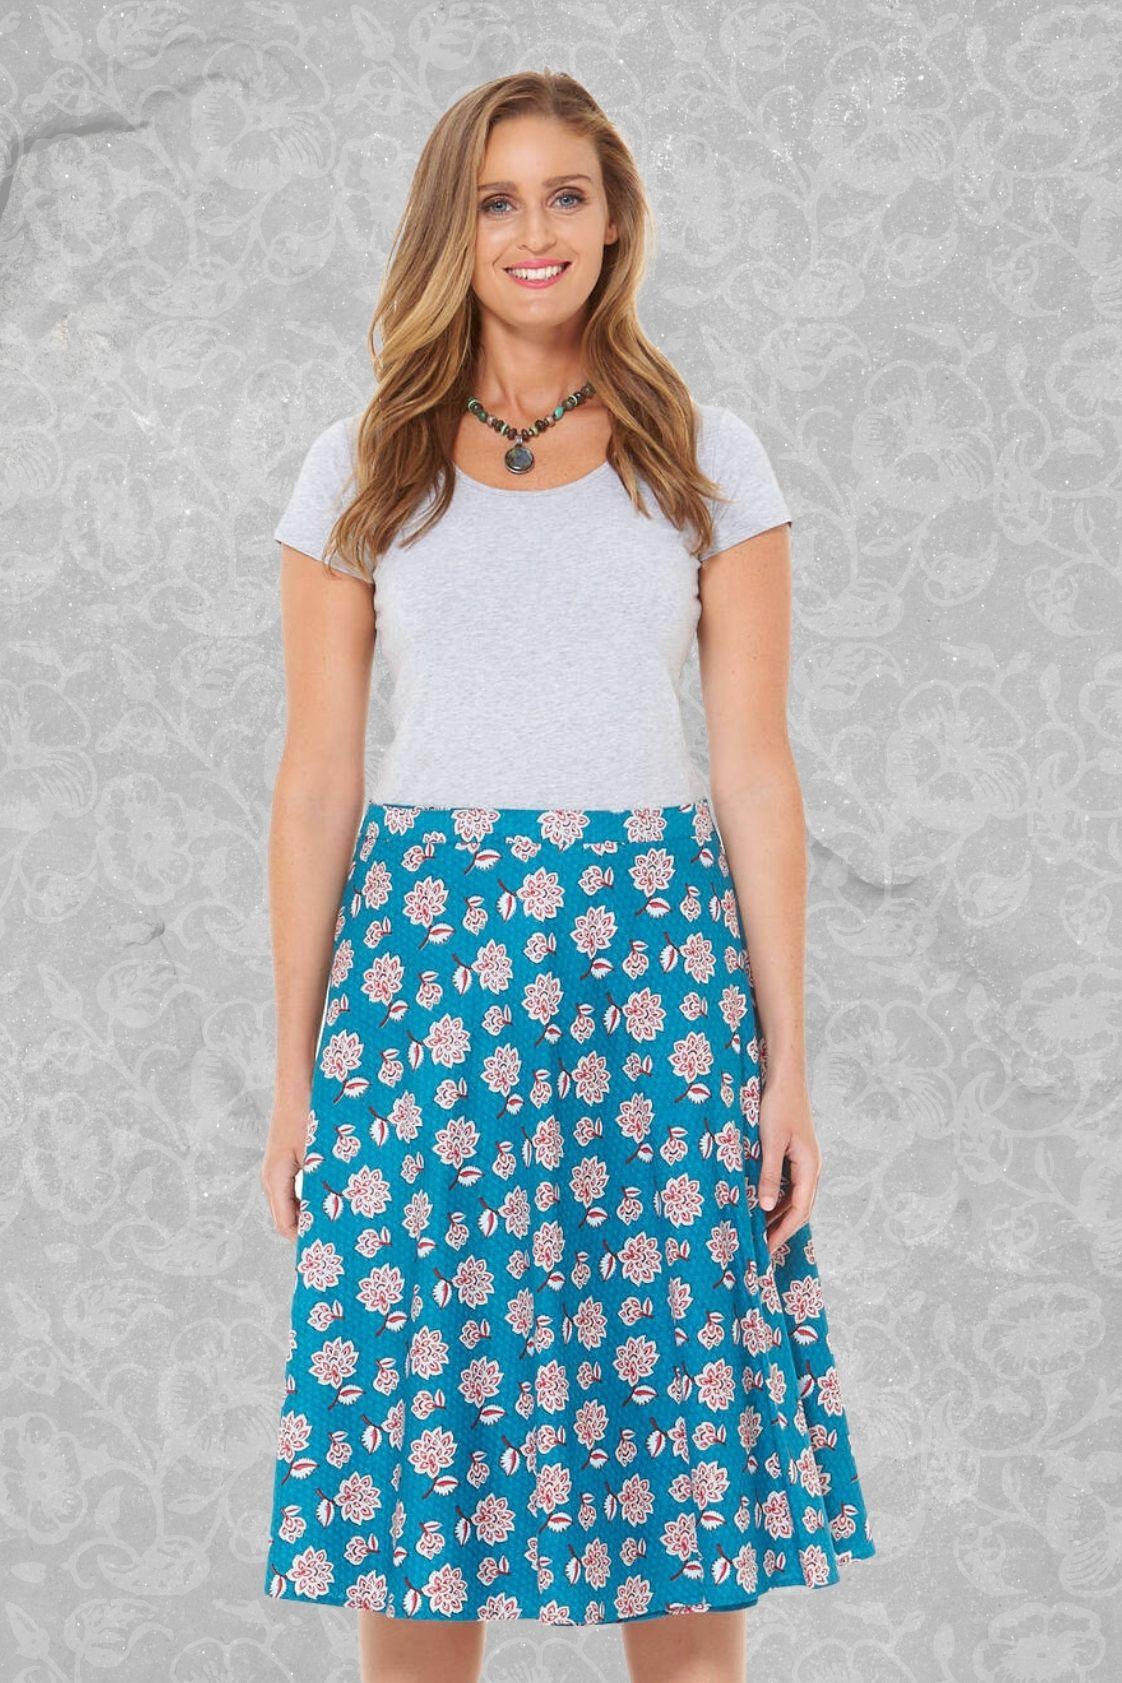 Beth Cotton Wrap Skirt – Yoko Print